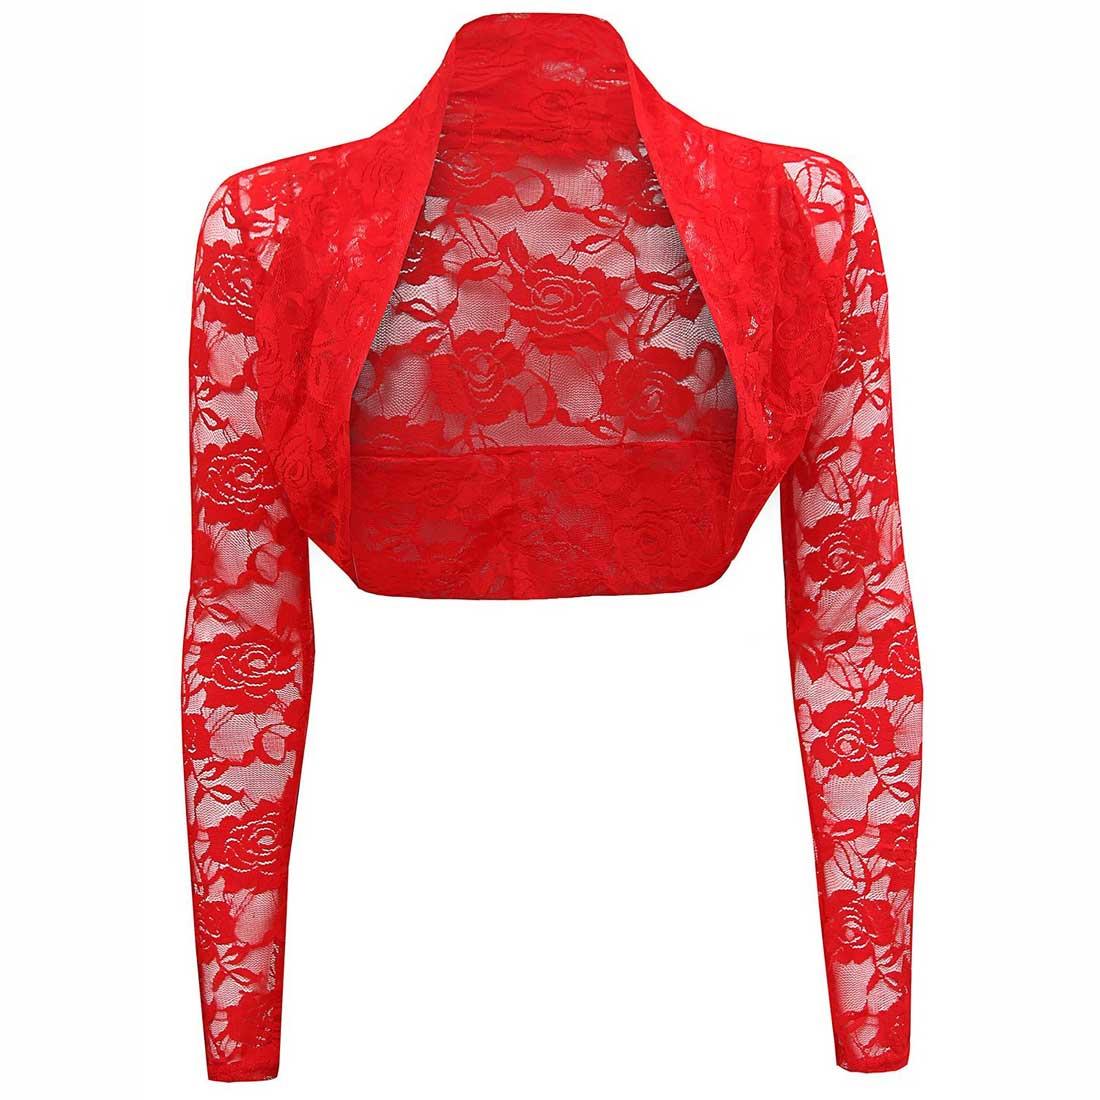 Womens Sheer Lace Shrug Bolero Long Sleeve Cropped Cardigan Top ...